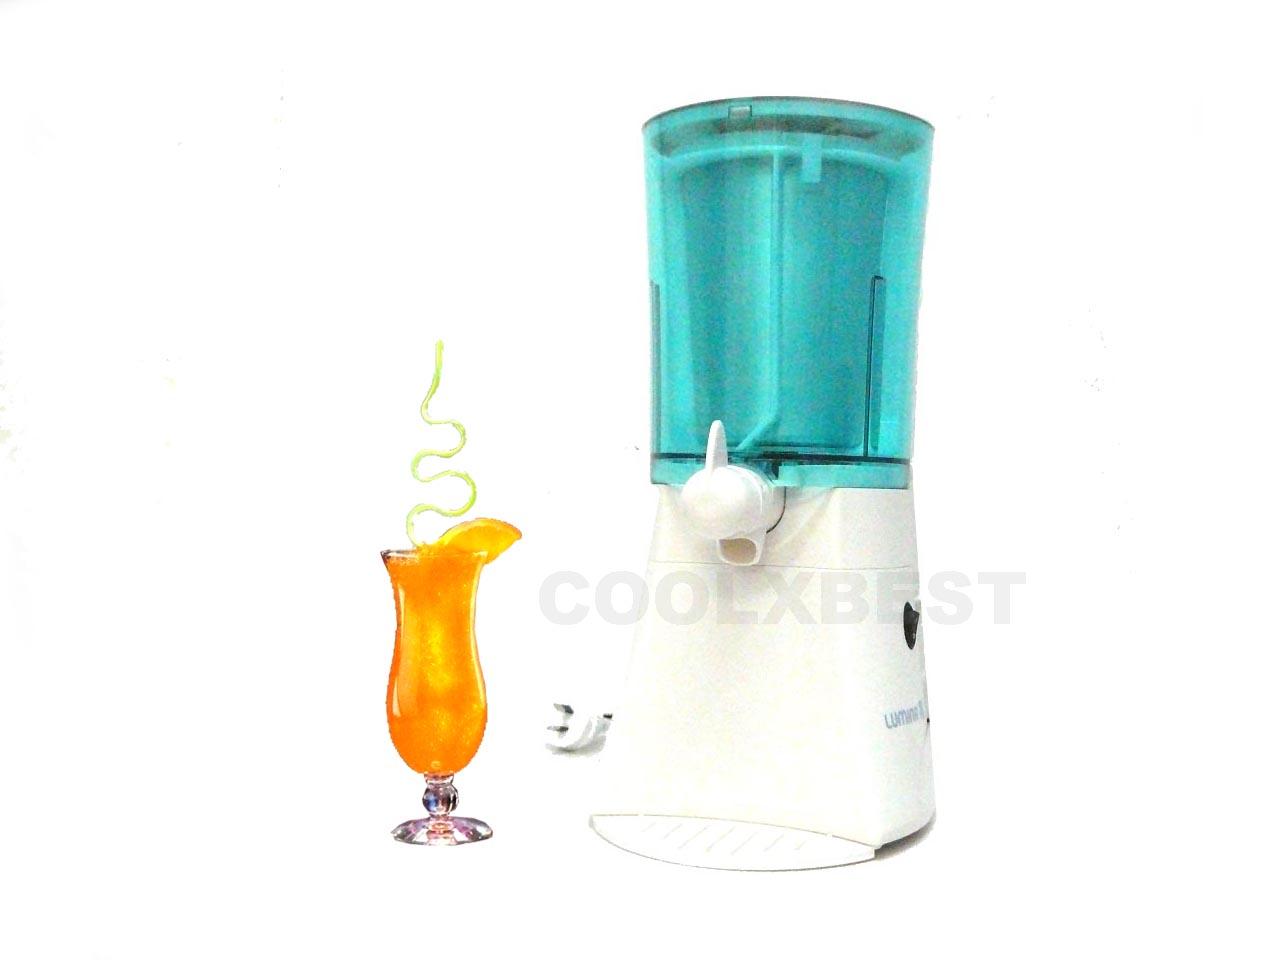 slushie slush frozen cocktail drink maker machine party fun ebay. Black Bedroom Furniture Sets. Home Design Ideas